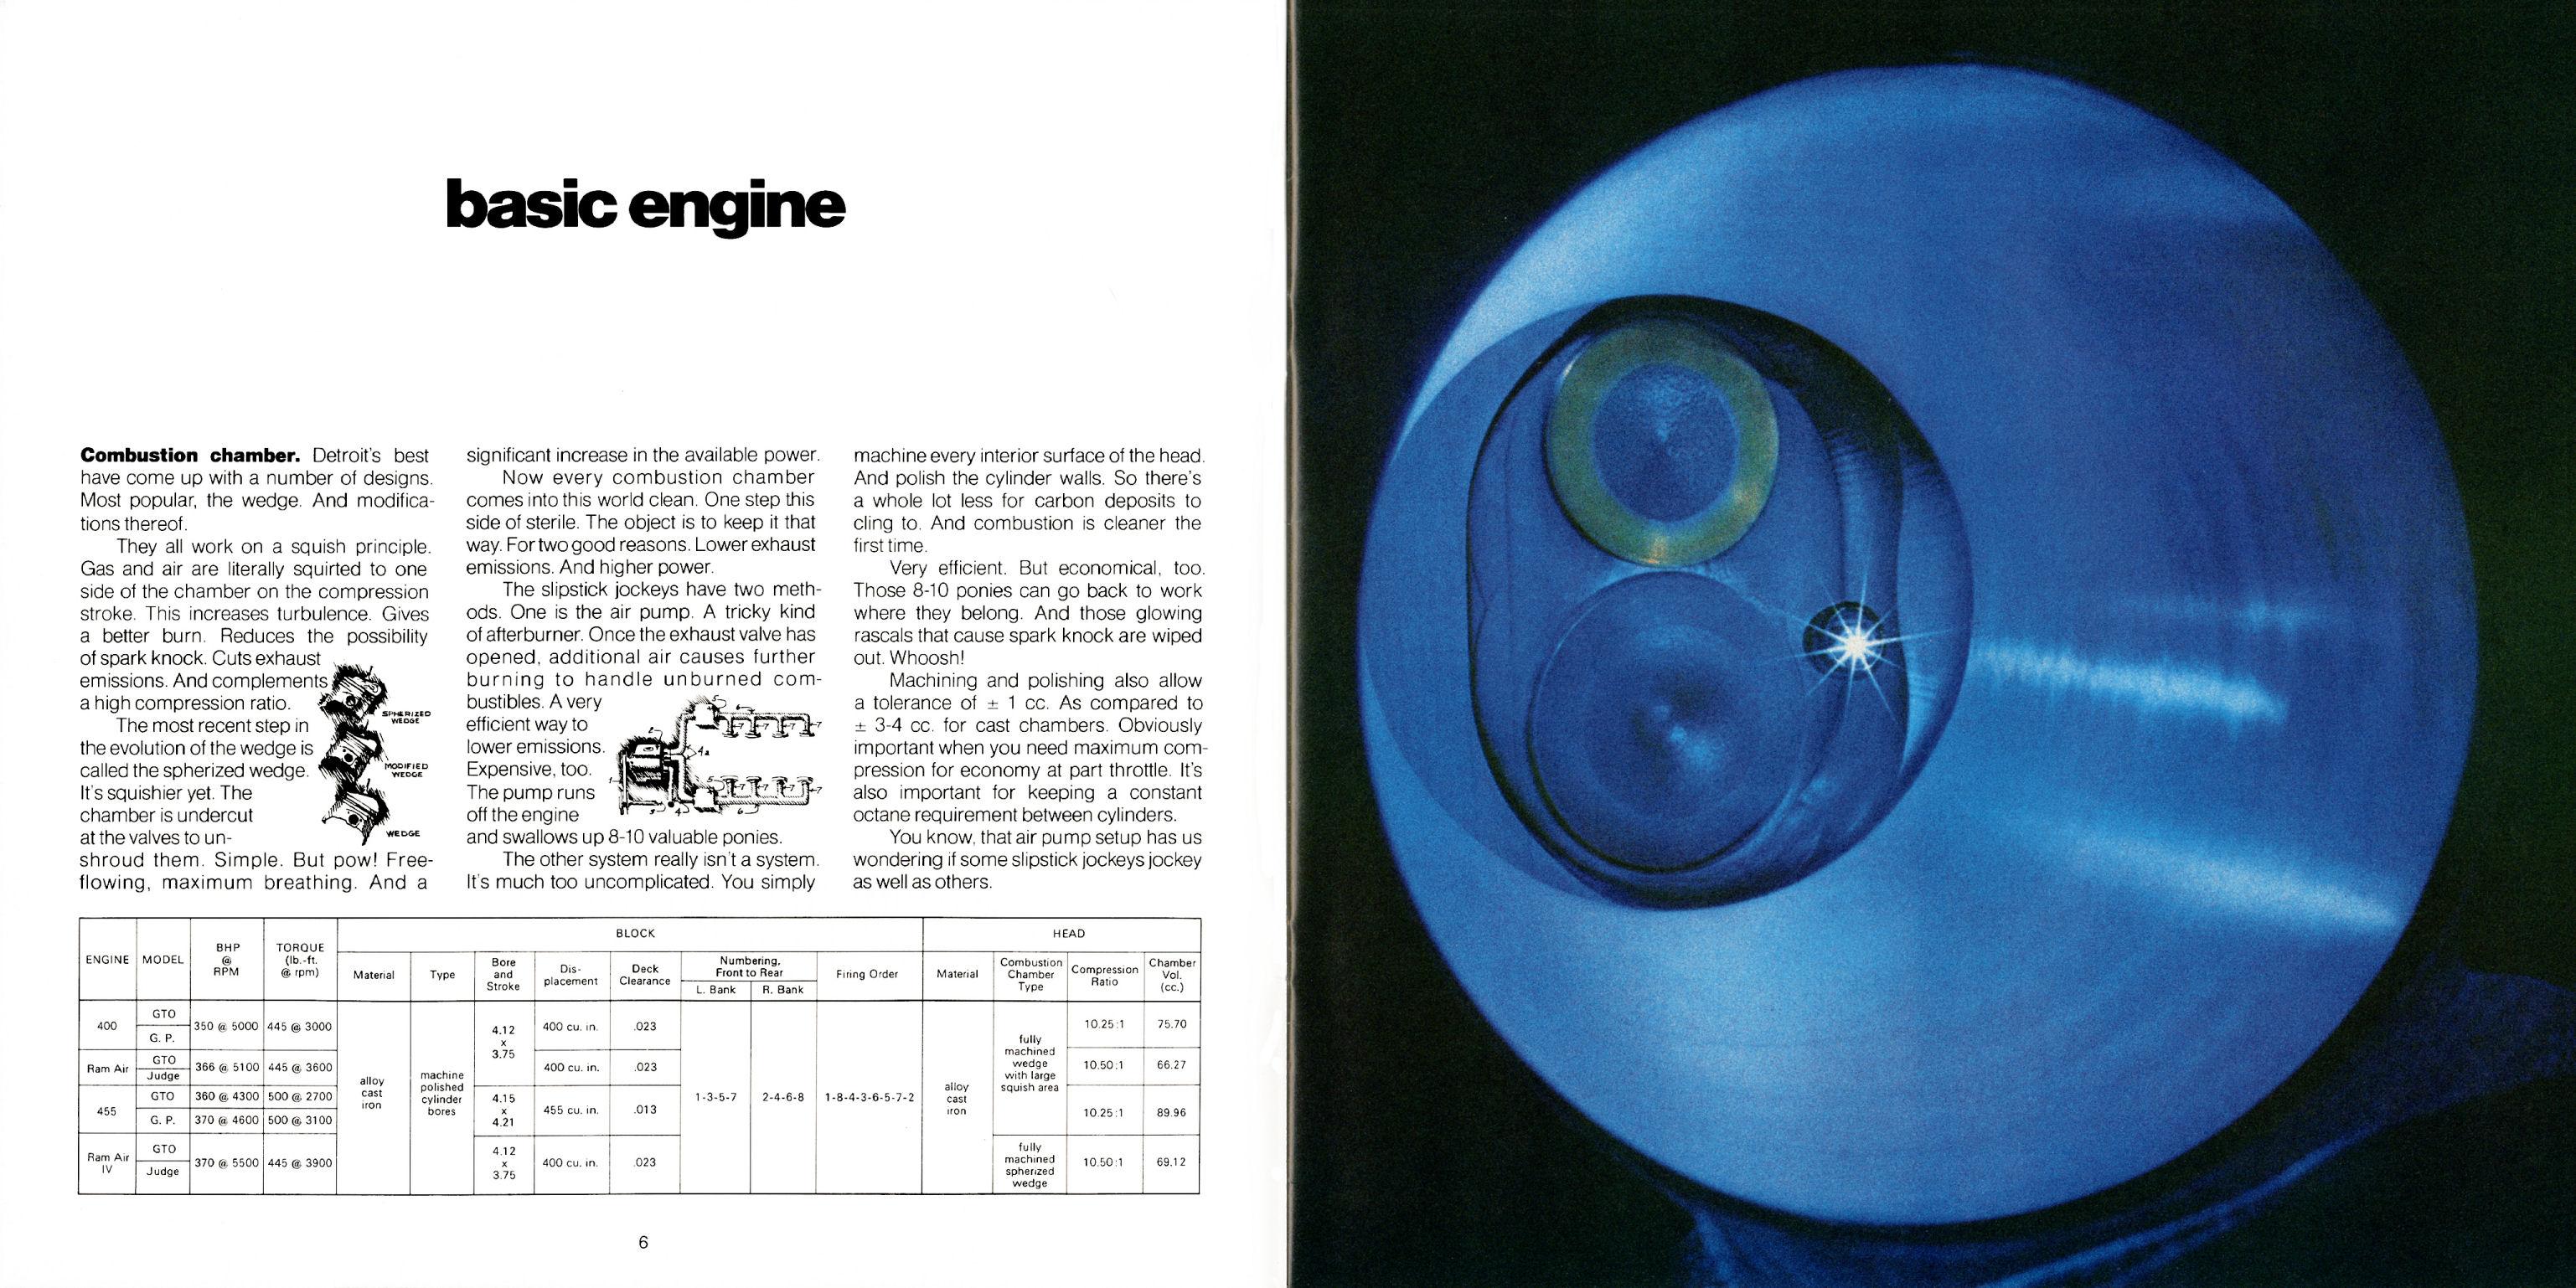 1970%20Pontiac%20Performance-06-07.jpg